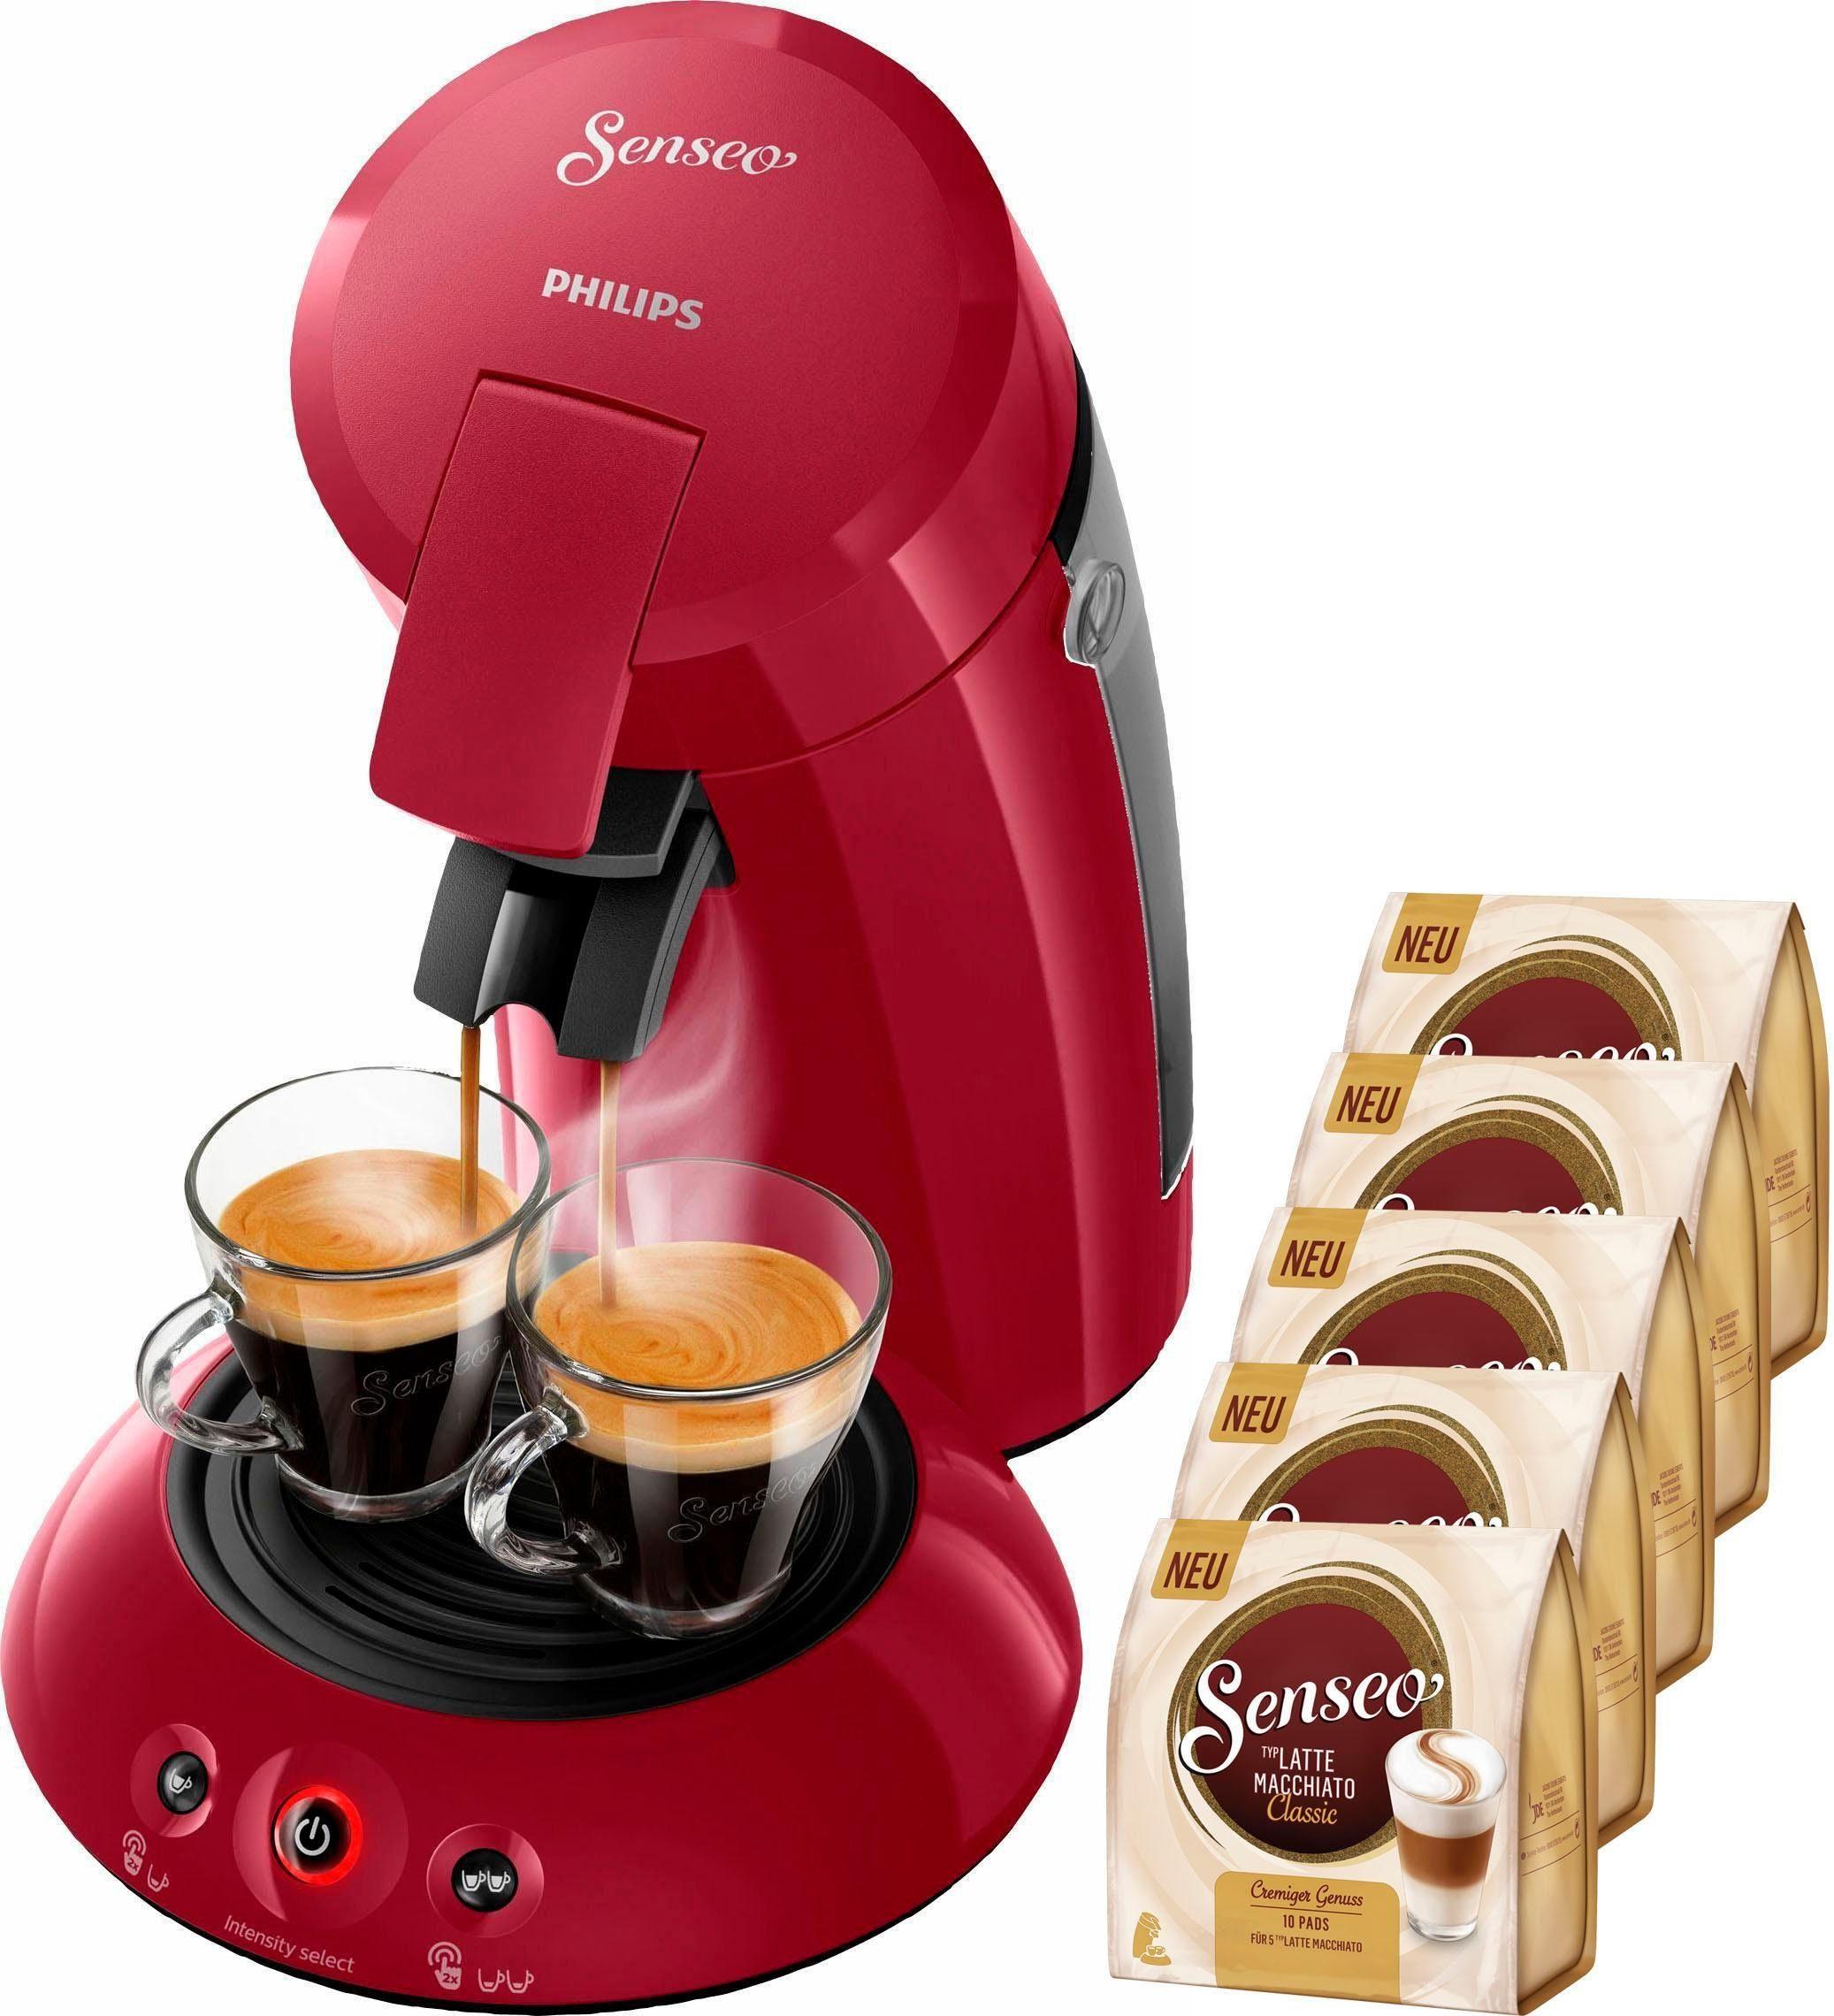 Senseo Kaffeepadmaschine HD6554/90 New Original, inkl. 5 Pakete Kaffeepads